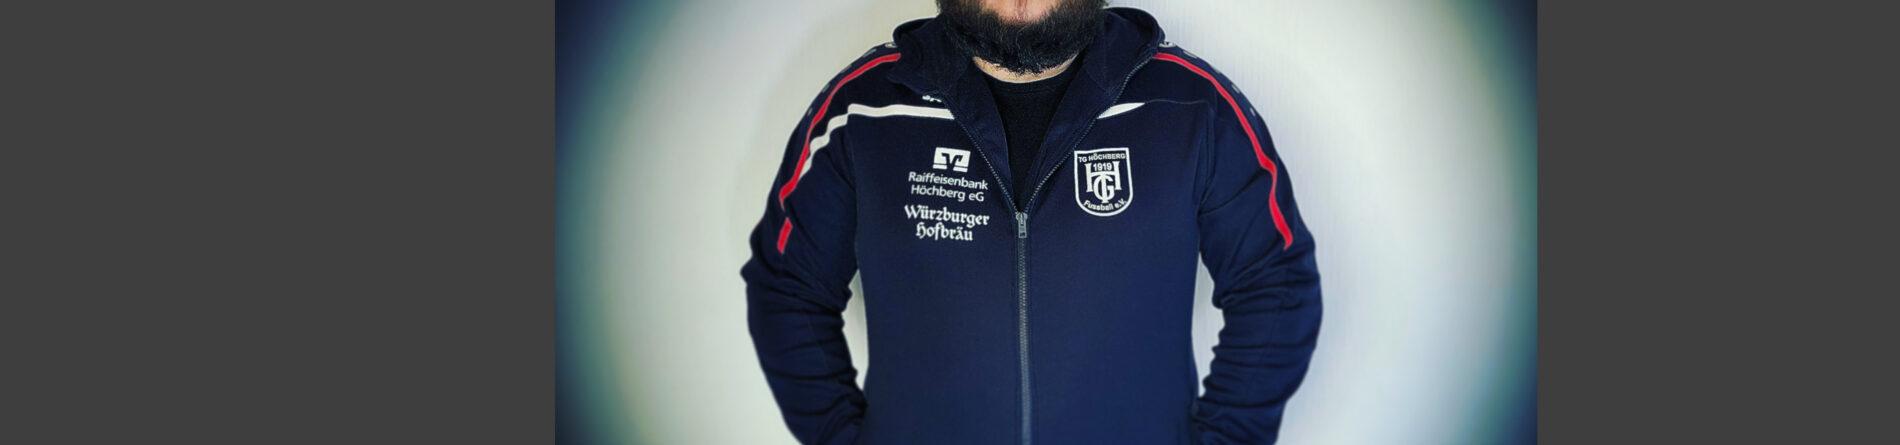 Neuer Trainer der 2. Mannschaft (SG TG Höchberg II / TSG Waldbüttelbrunn